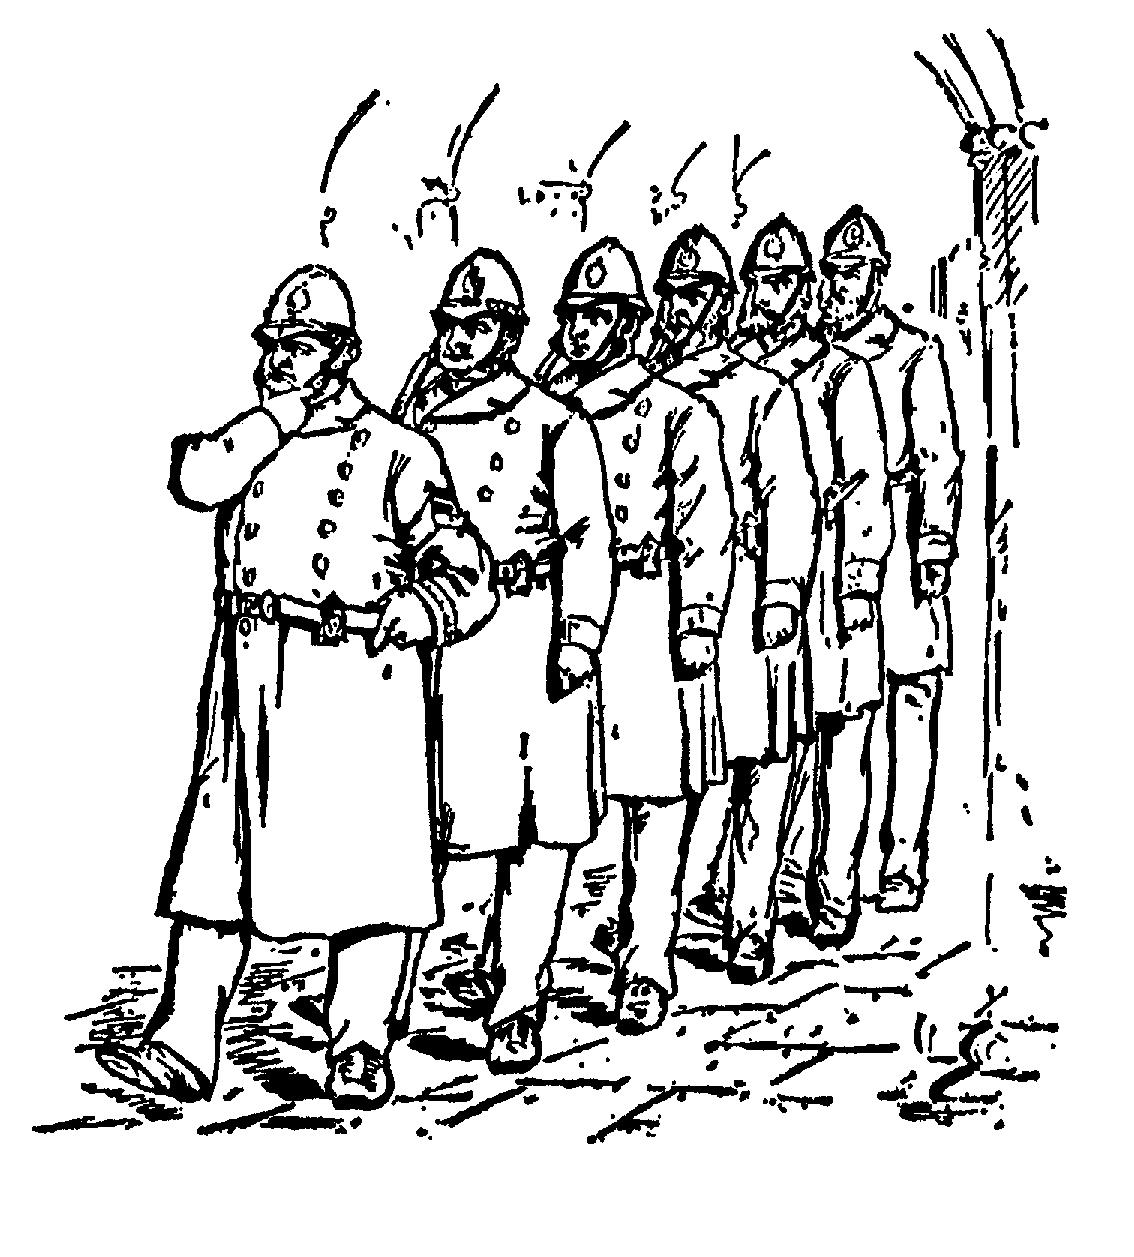 Drawn pirate penzance And Sullivan by Penzance Arthur